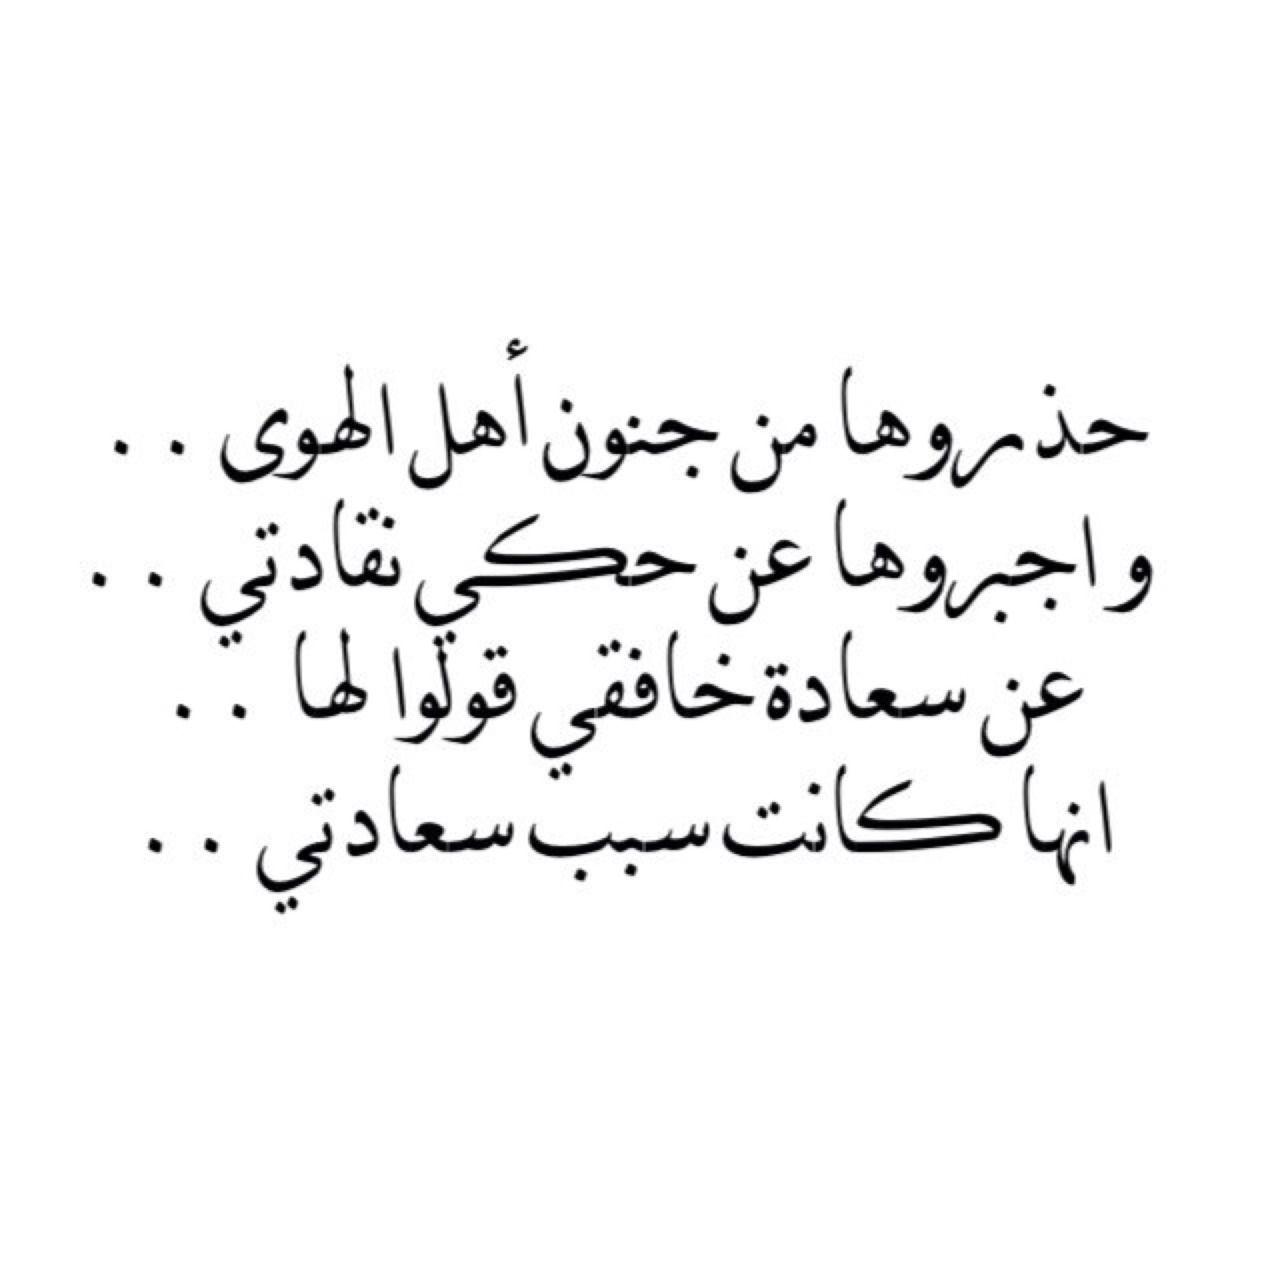 ليش انت بالذات تعلقت فيك وليه كل ماغفيت صحيت ادور كلامك م Favorite Quotes Words Quotes